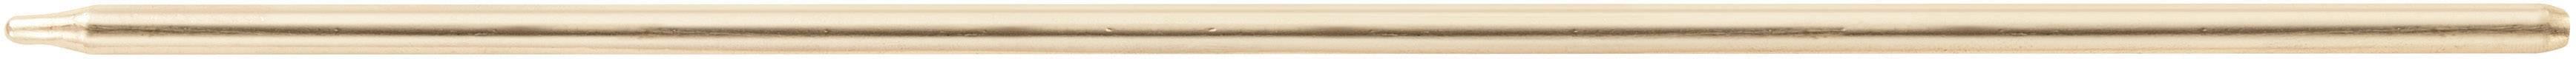 Teplovodivá trubka Sinter-Heatpipe Gelid CP-S6300-01, 25 W